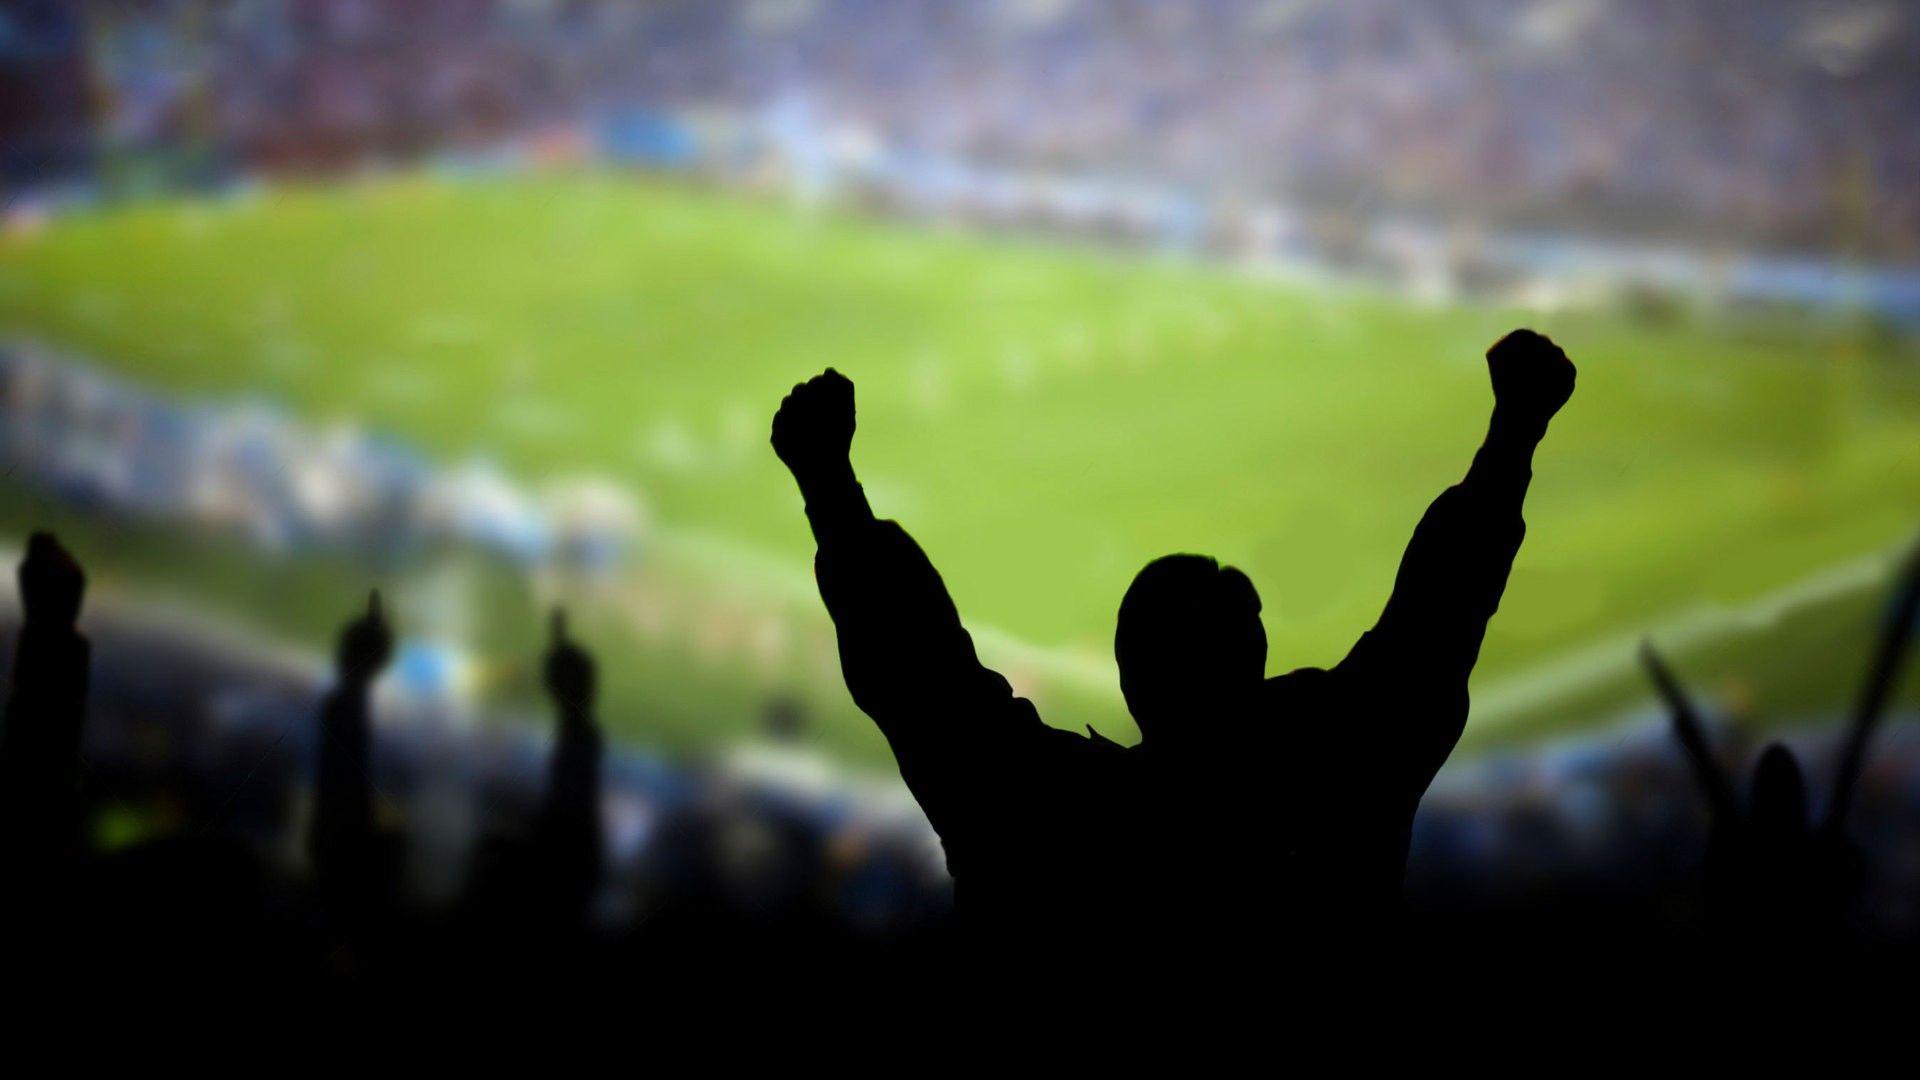 Football Fans Wallpaper Football Fans Wallpaper Football